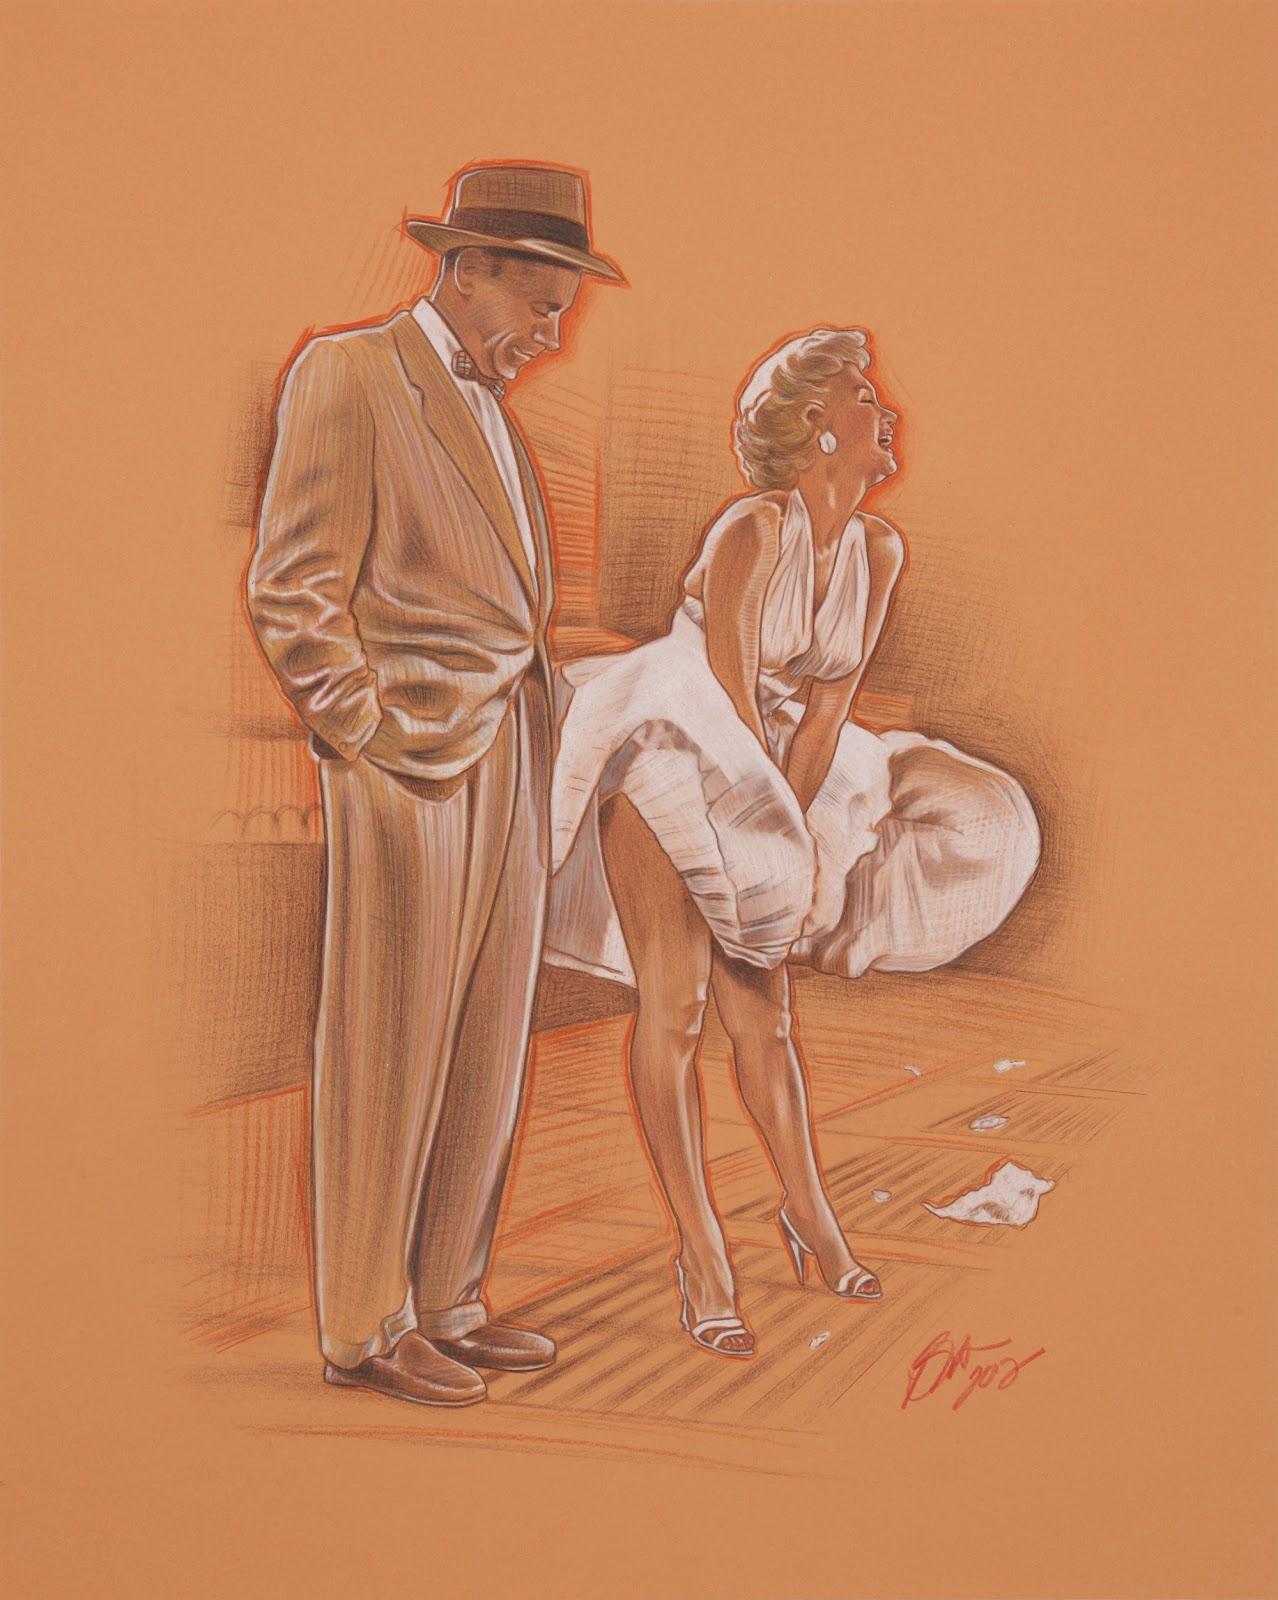 http://2.bp.blogspot.com/-KtgyQa3e1Ys/UNMaaDjYe4I/AAAAAAAAAMw/DQDrU4rTvtI/s1600/Marilyn+Monroe_7+Year+Itchrs.jpg